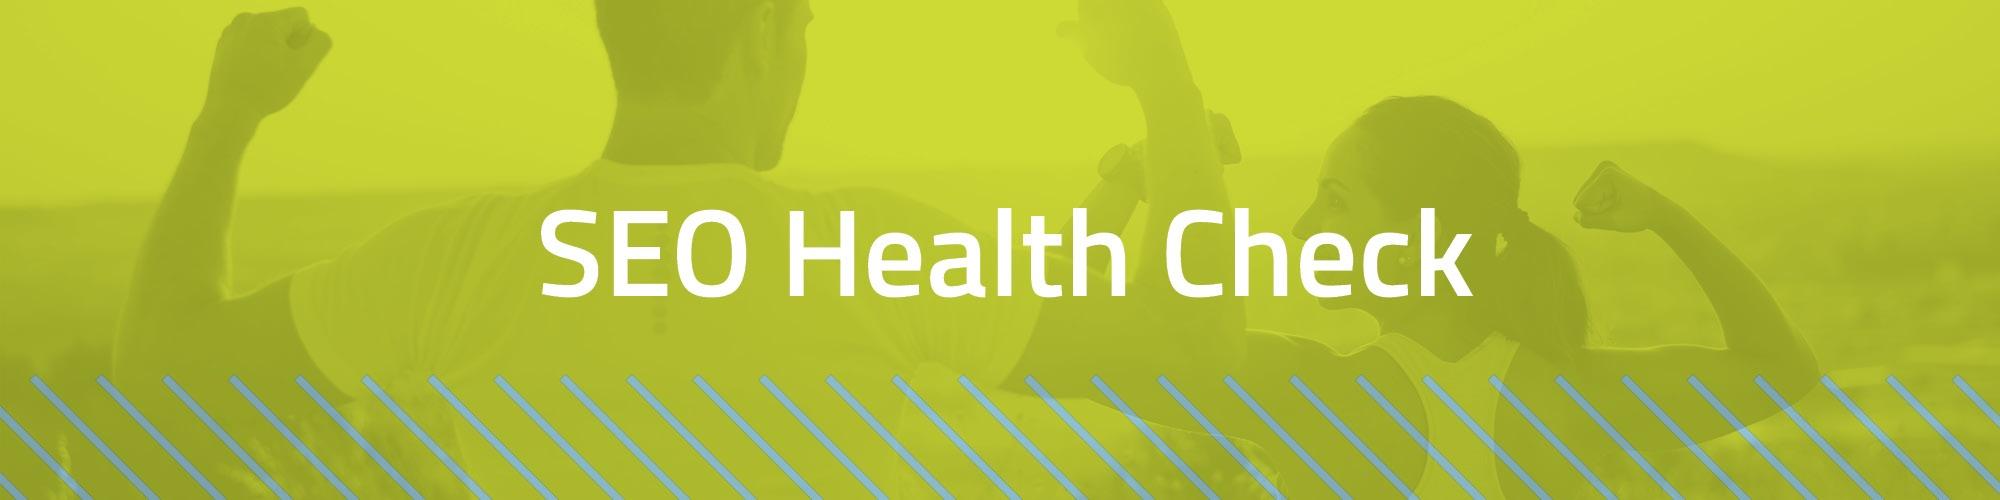 Imagewerks Marketing SEO Health Check